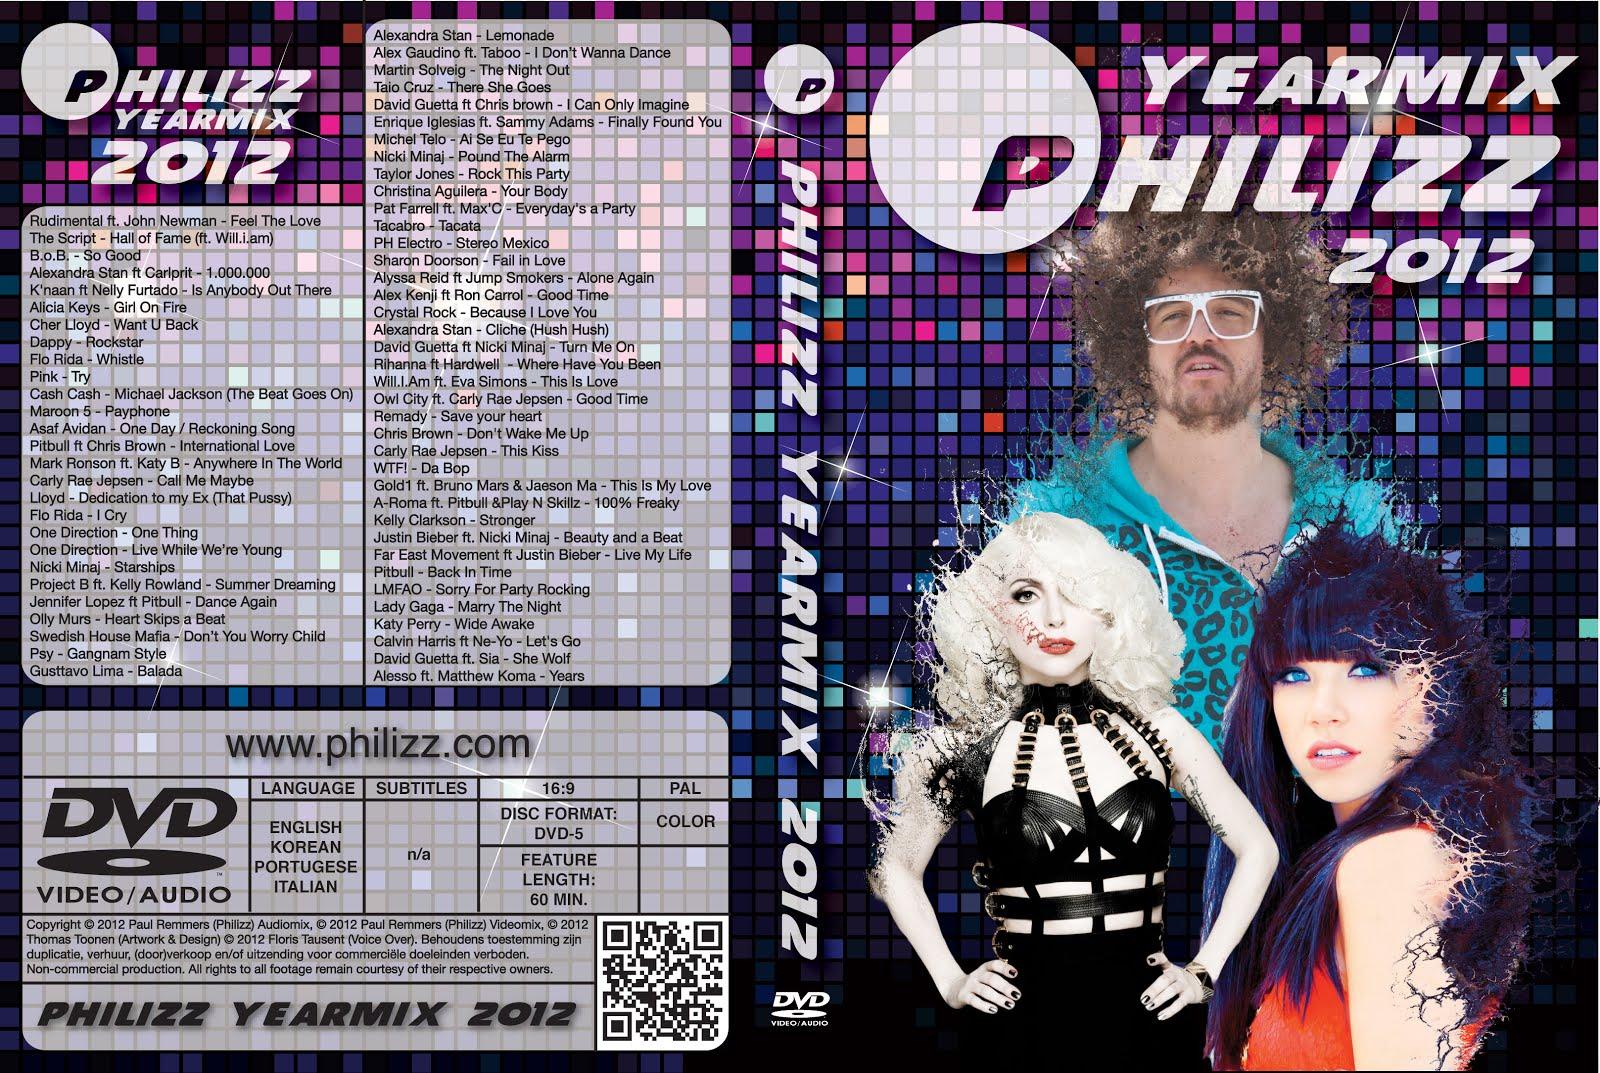 Philizz - Video Yearmix 2012